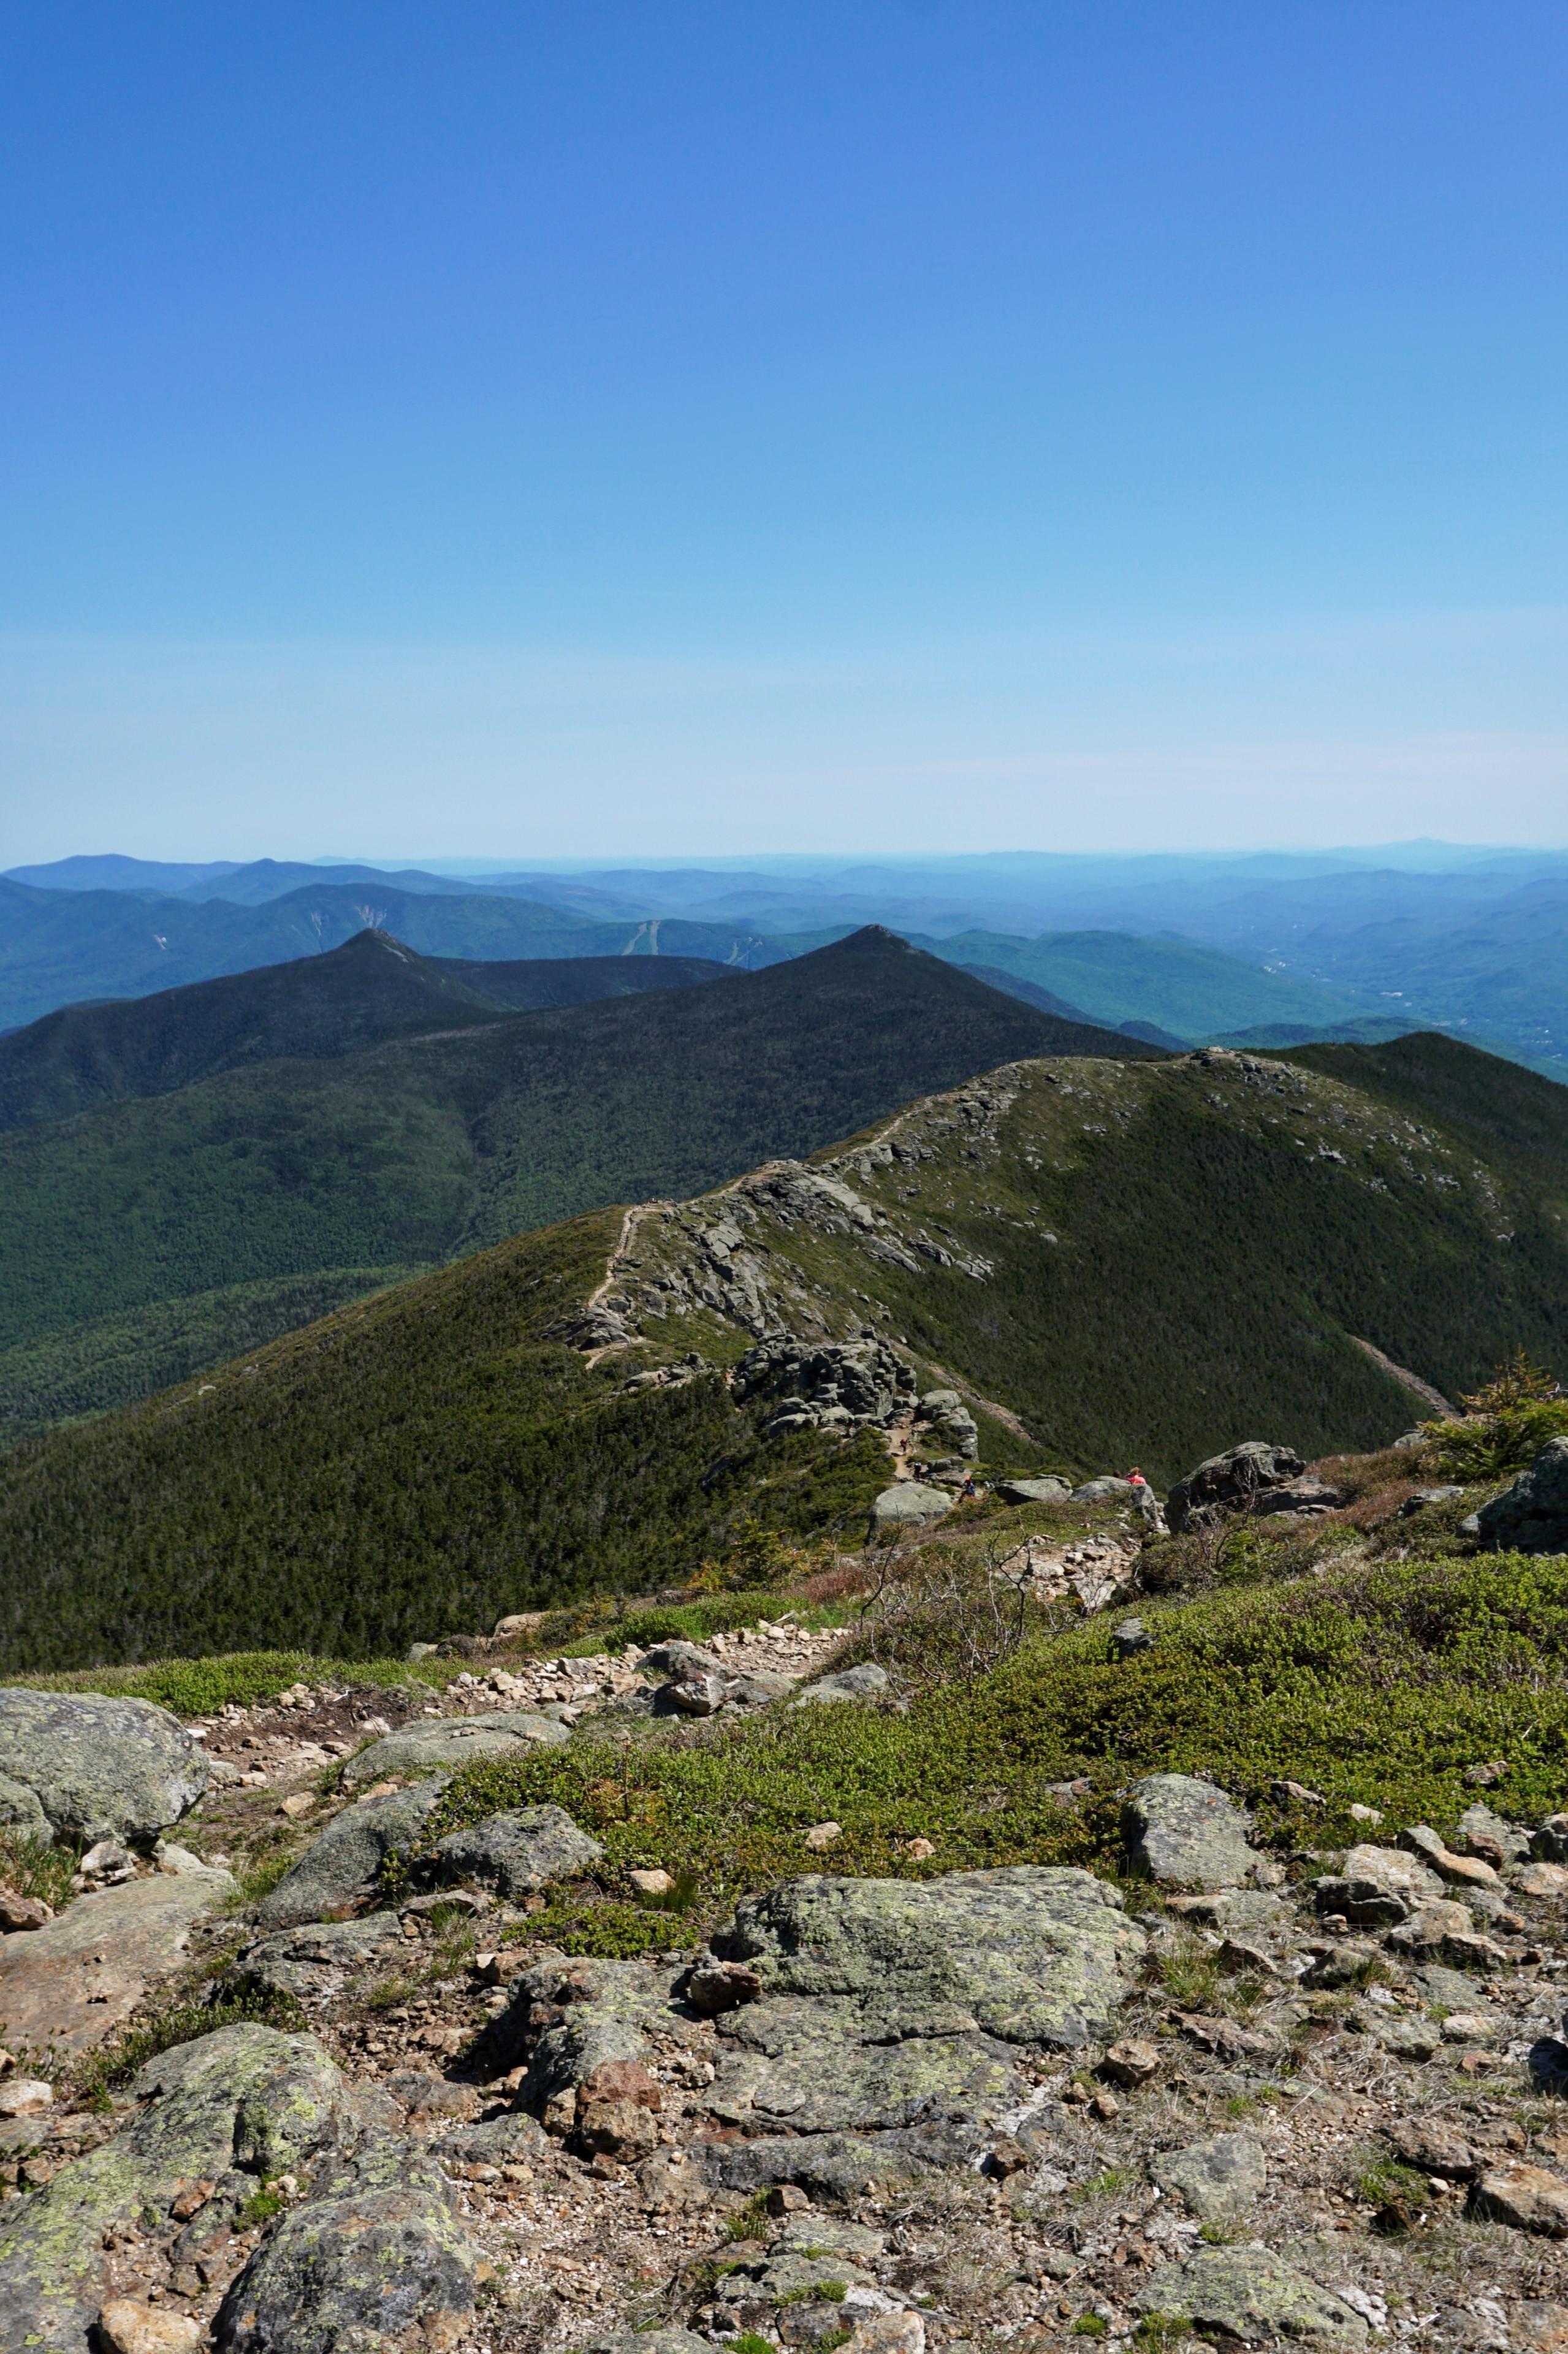 Campton, New Hampshire, United States of America